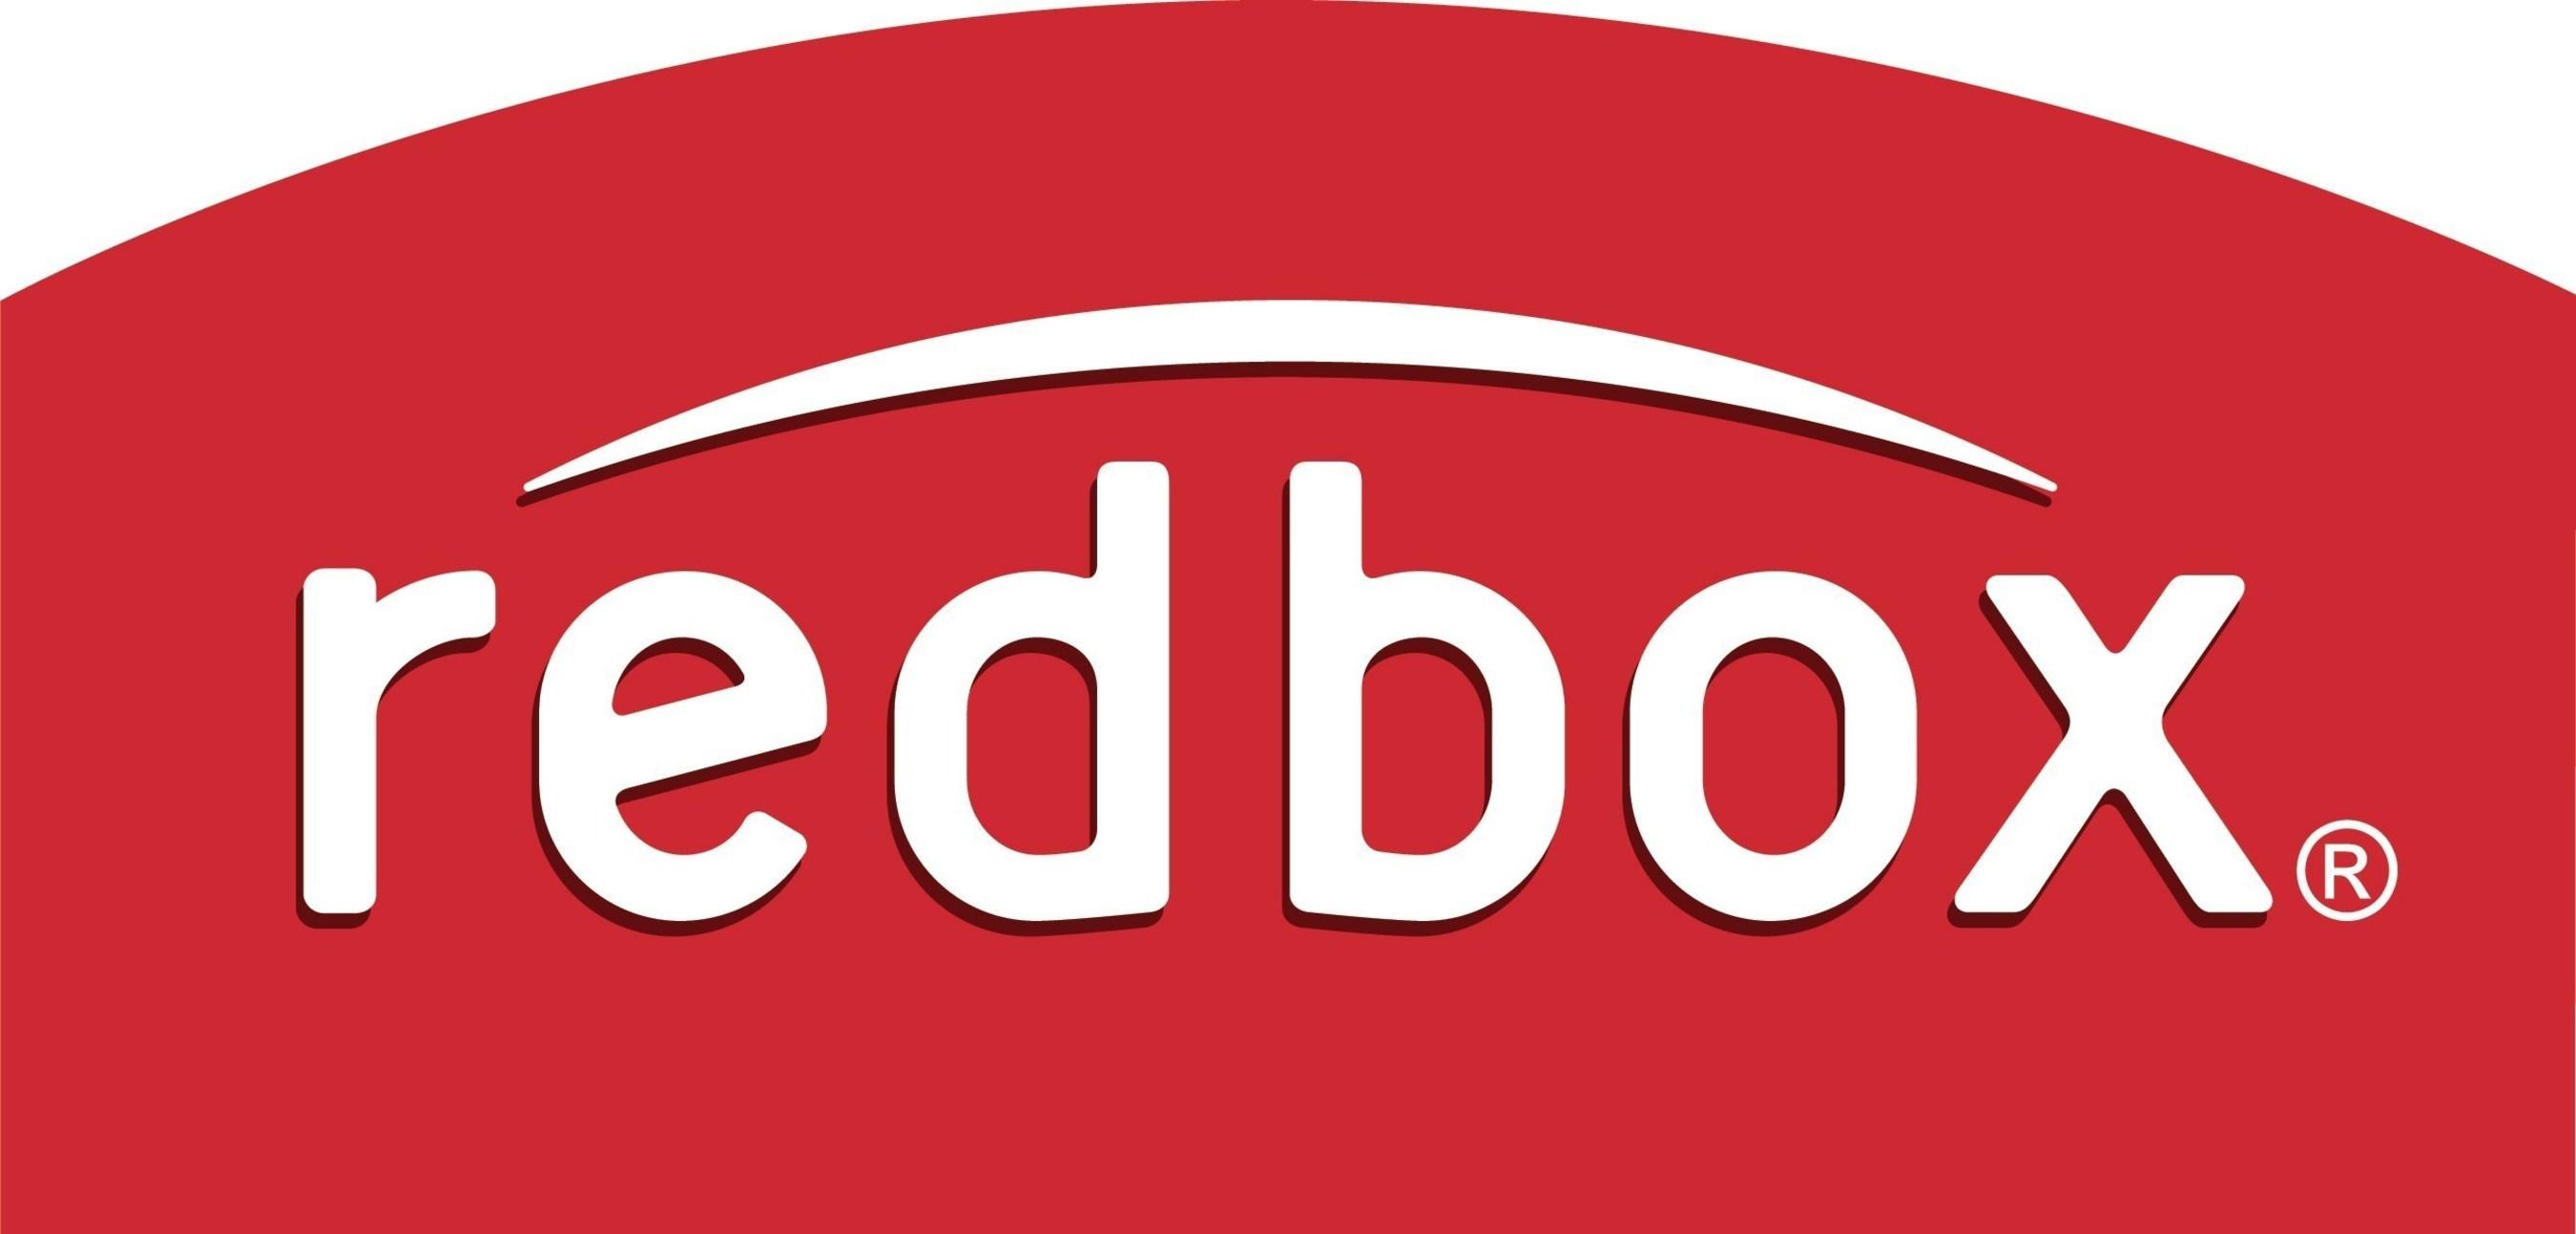 Redbox Presents America's Movie Night On November 16